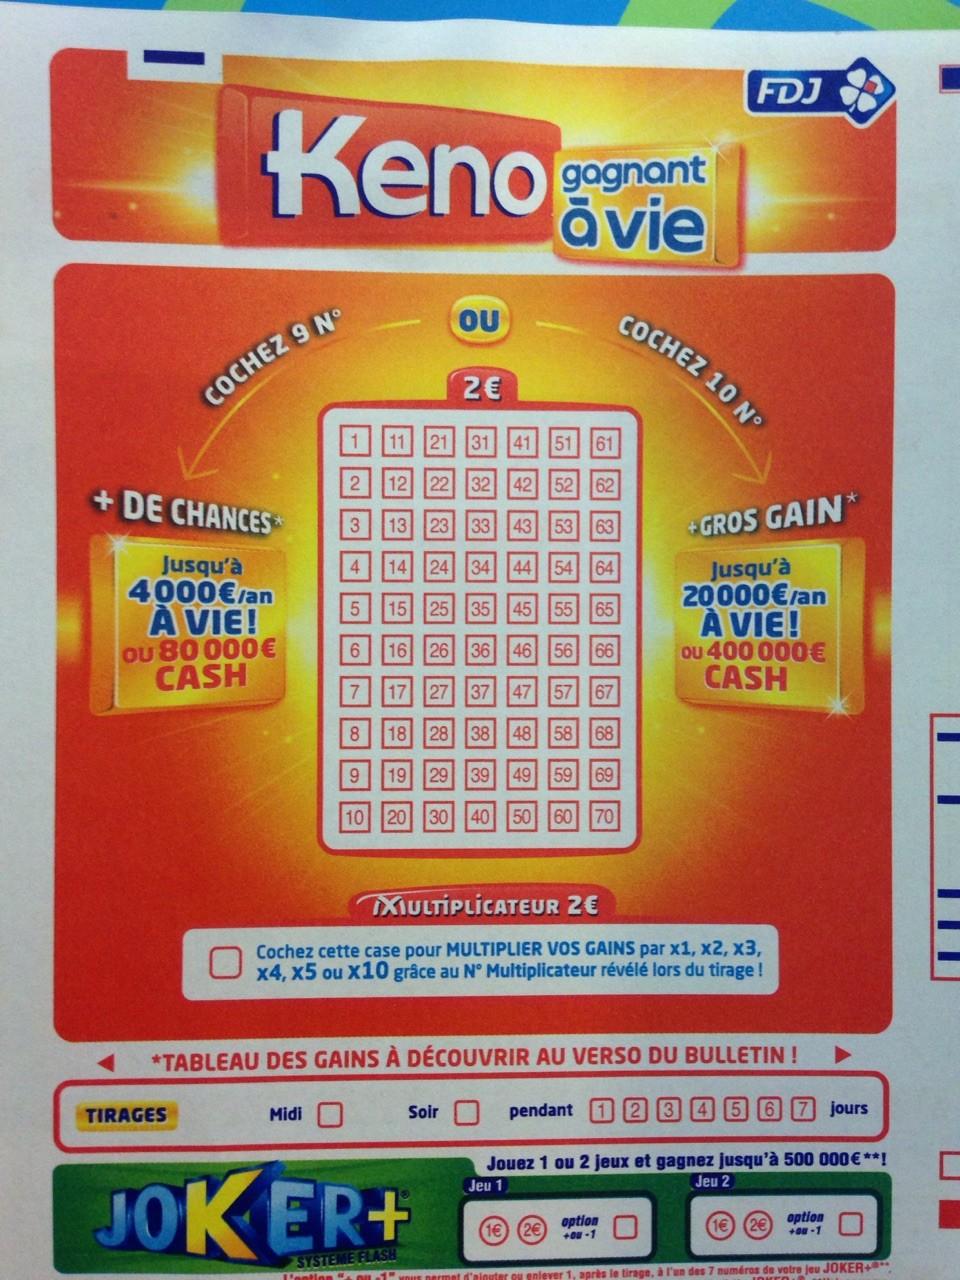 Keno draw world 24990